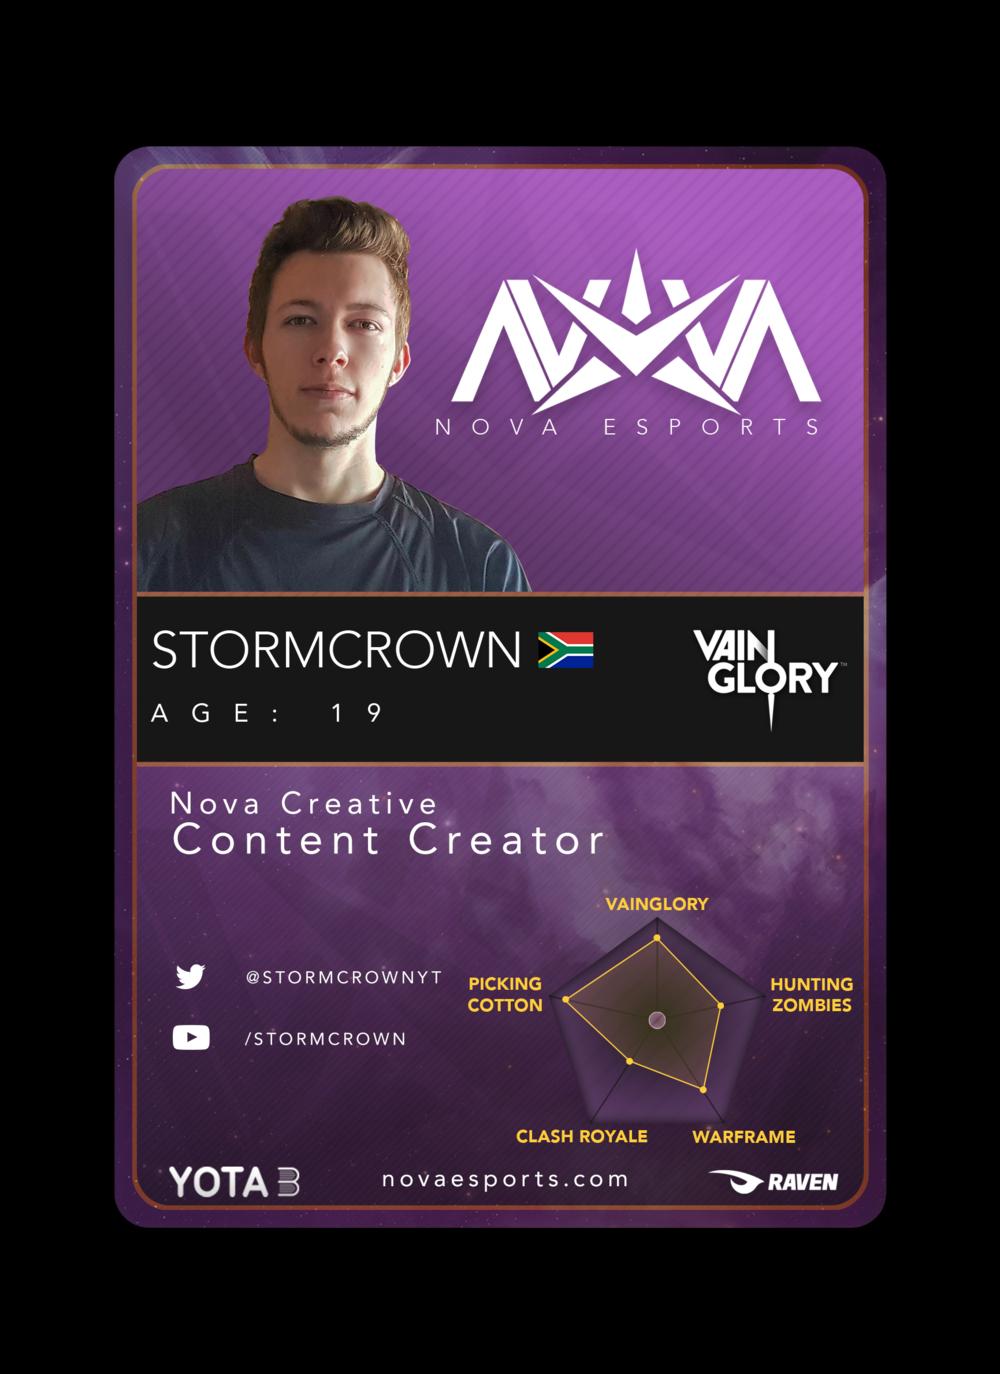 playercard_websitemockup_Stormcrownplayercard_vertical.png